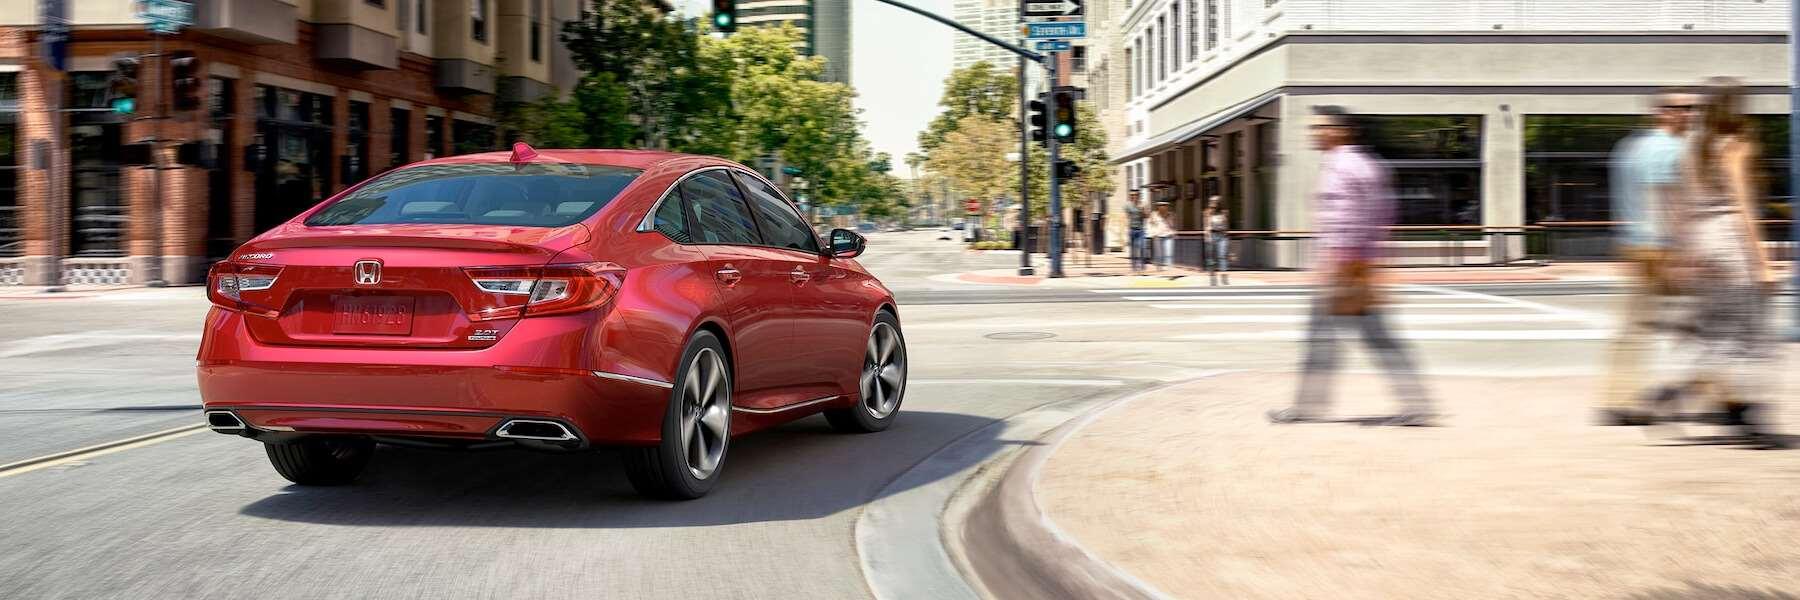 2020 Honda Accord Trim Levels Performance Image